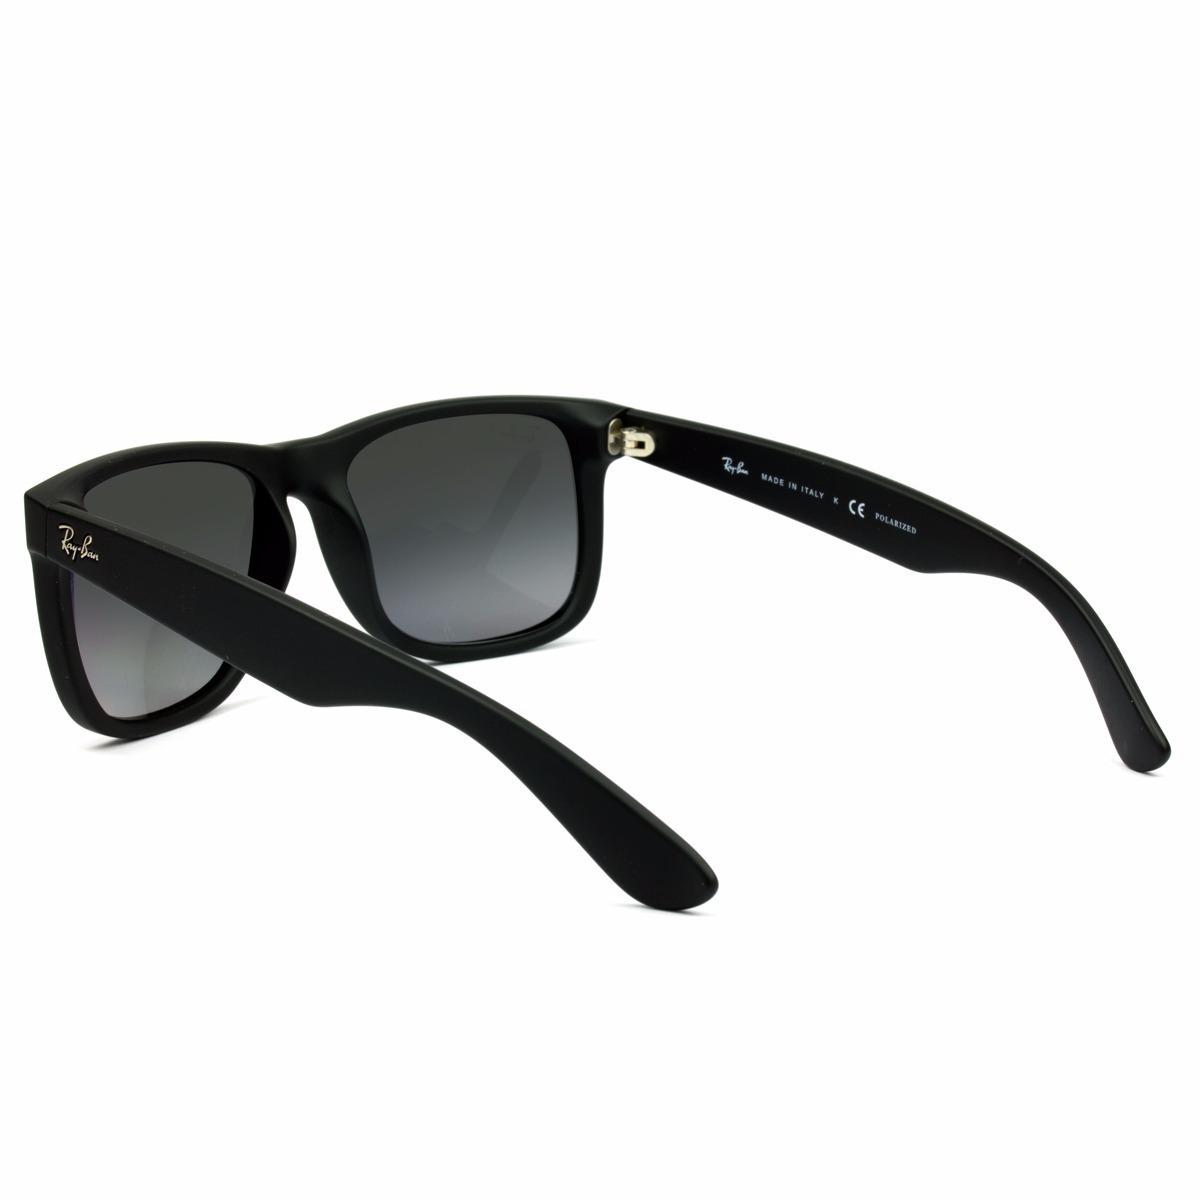 ea83e3d84ec0a óculos de sol ray-ban justin rb4165l 622 t3. Carregando zoom.